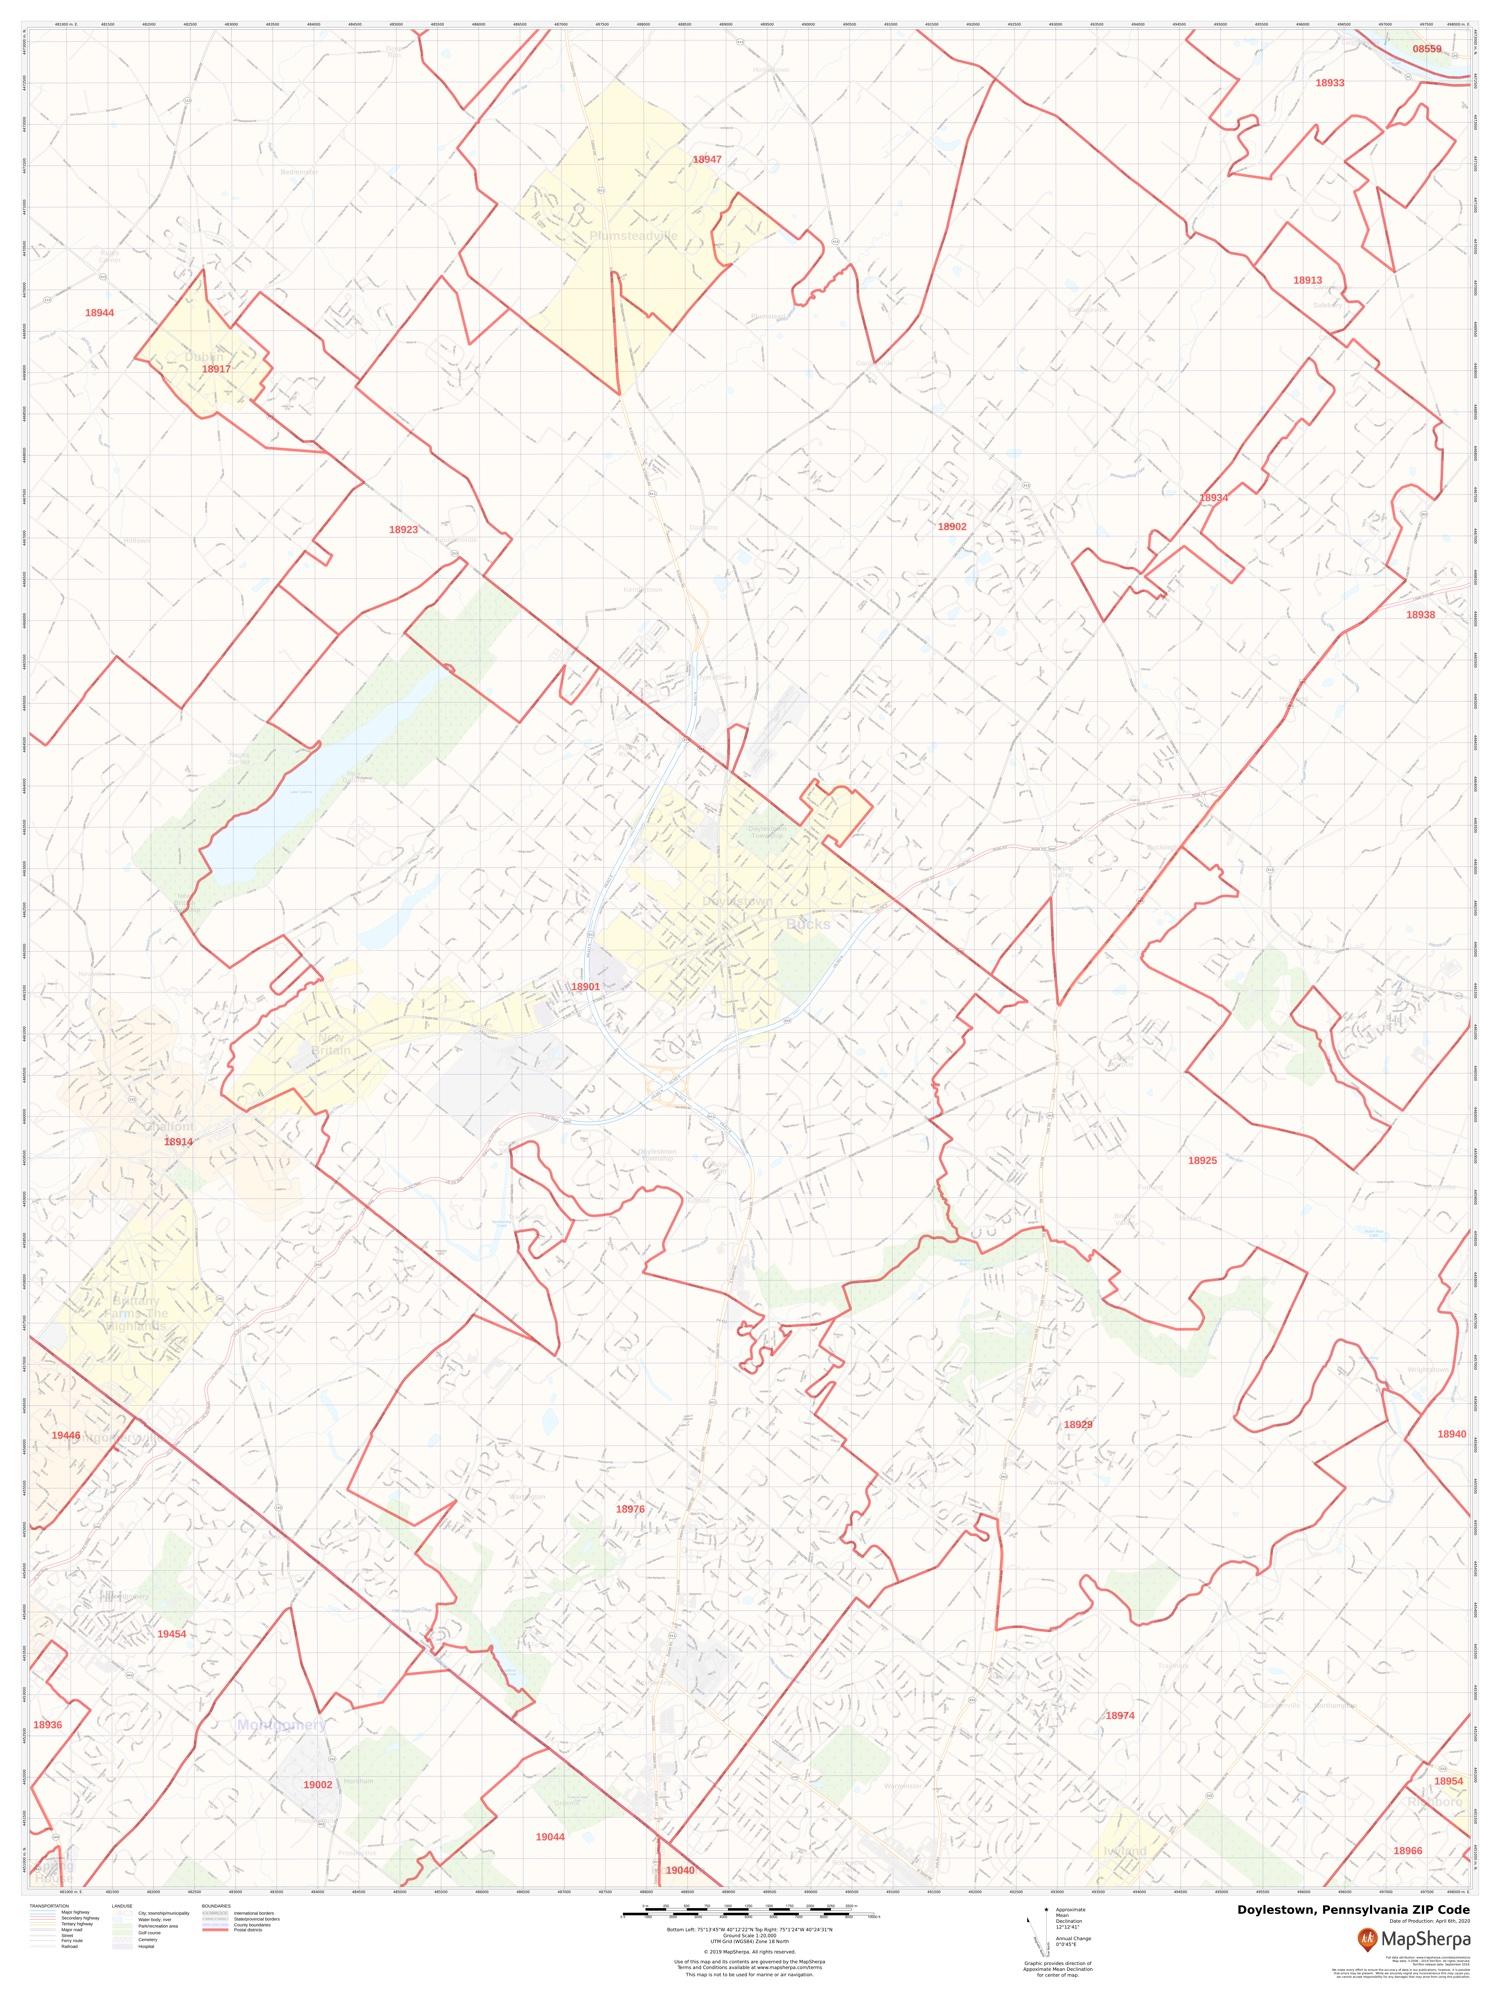 Montgomery County Pa Zip Code Map : montgomery, county, Doylestown